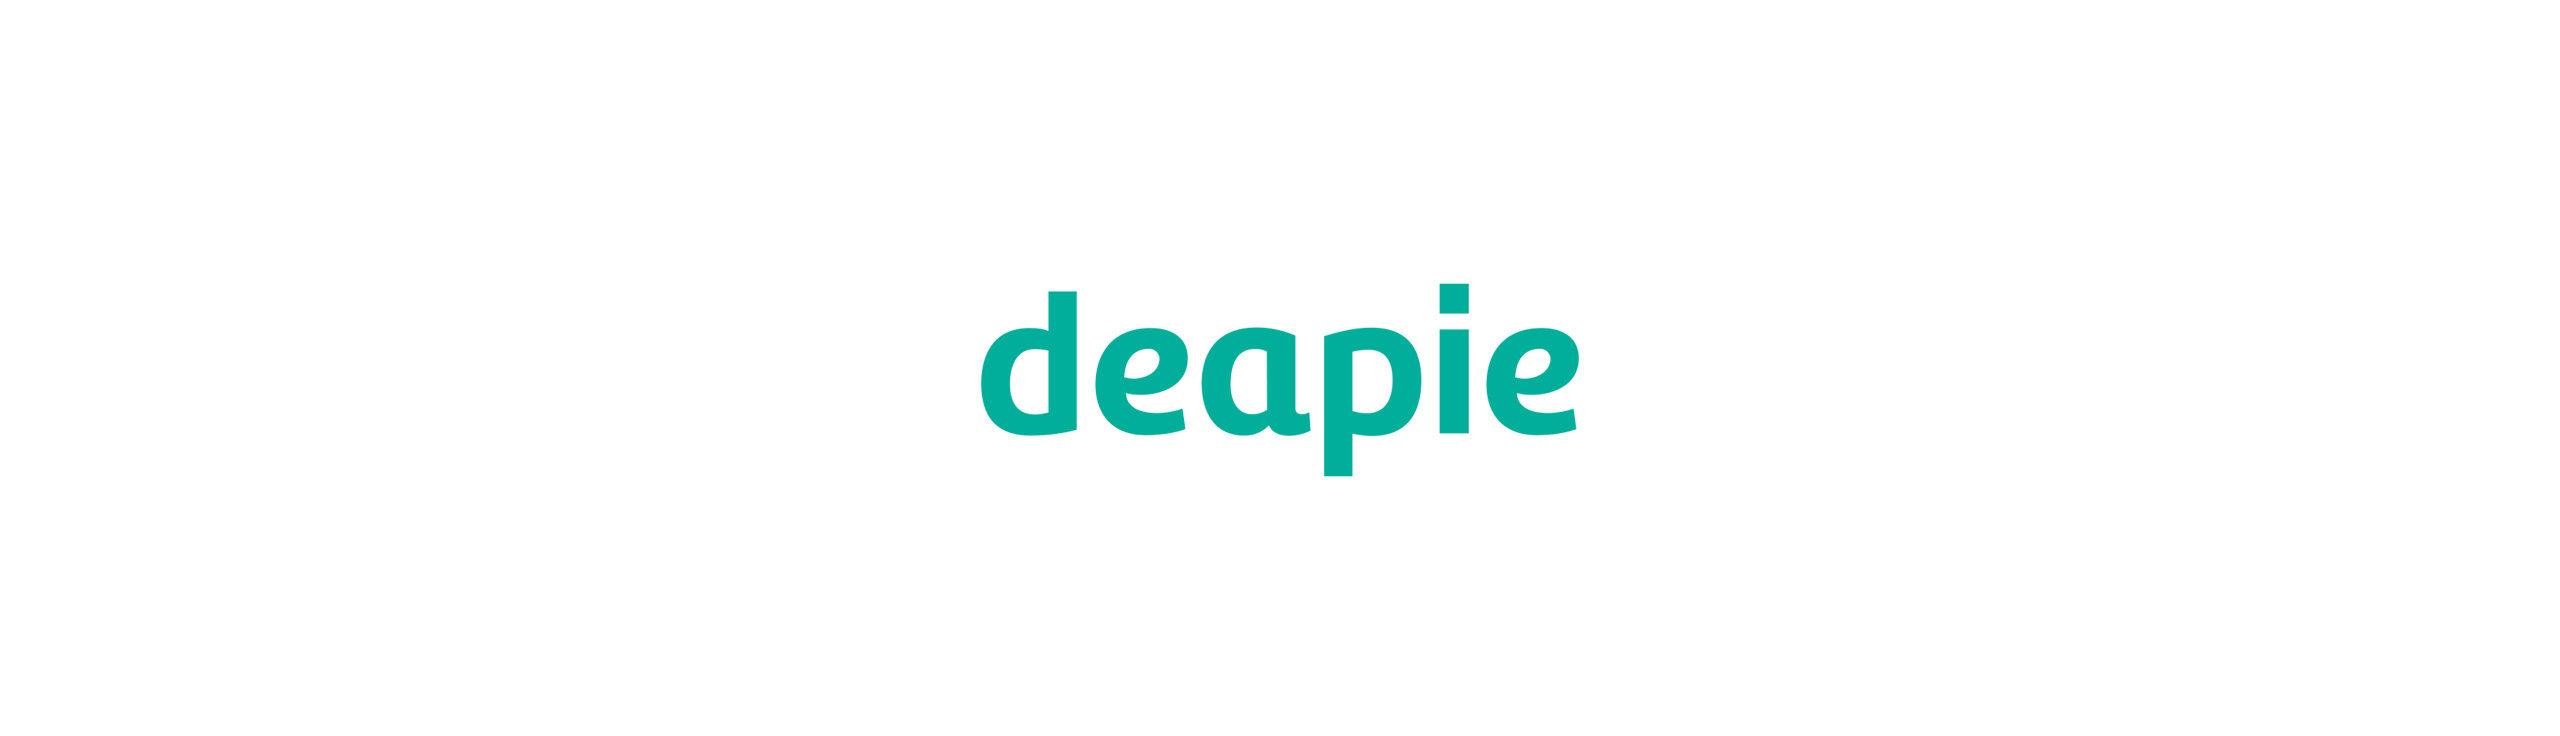 marinagoni-deapie-logo